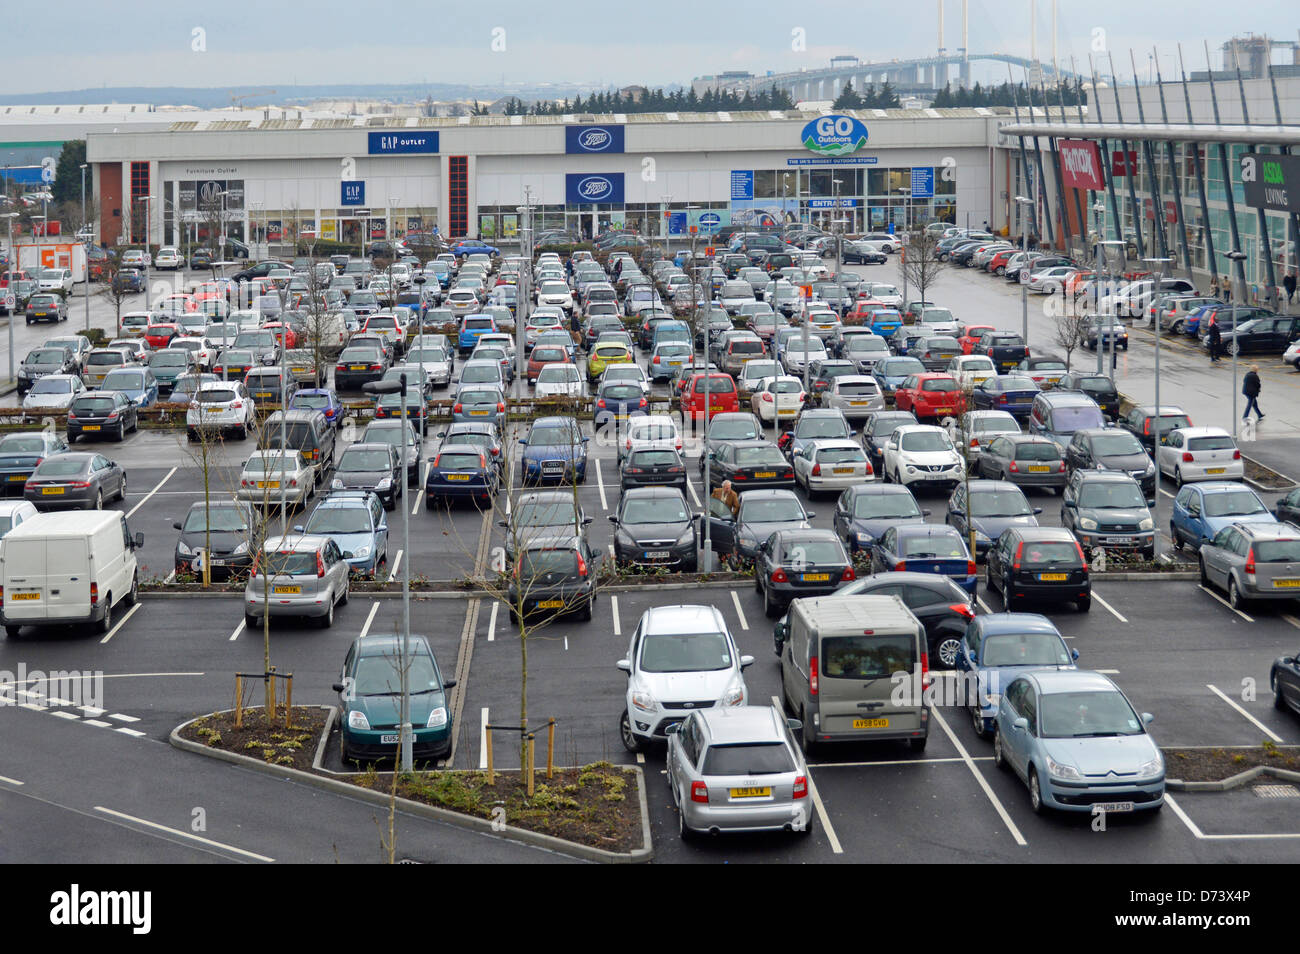 Shopping Centre Car Park High